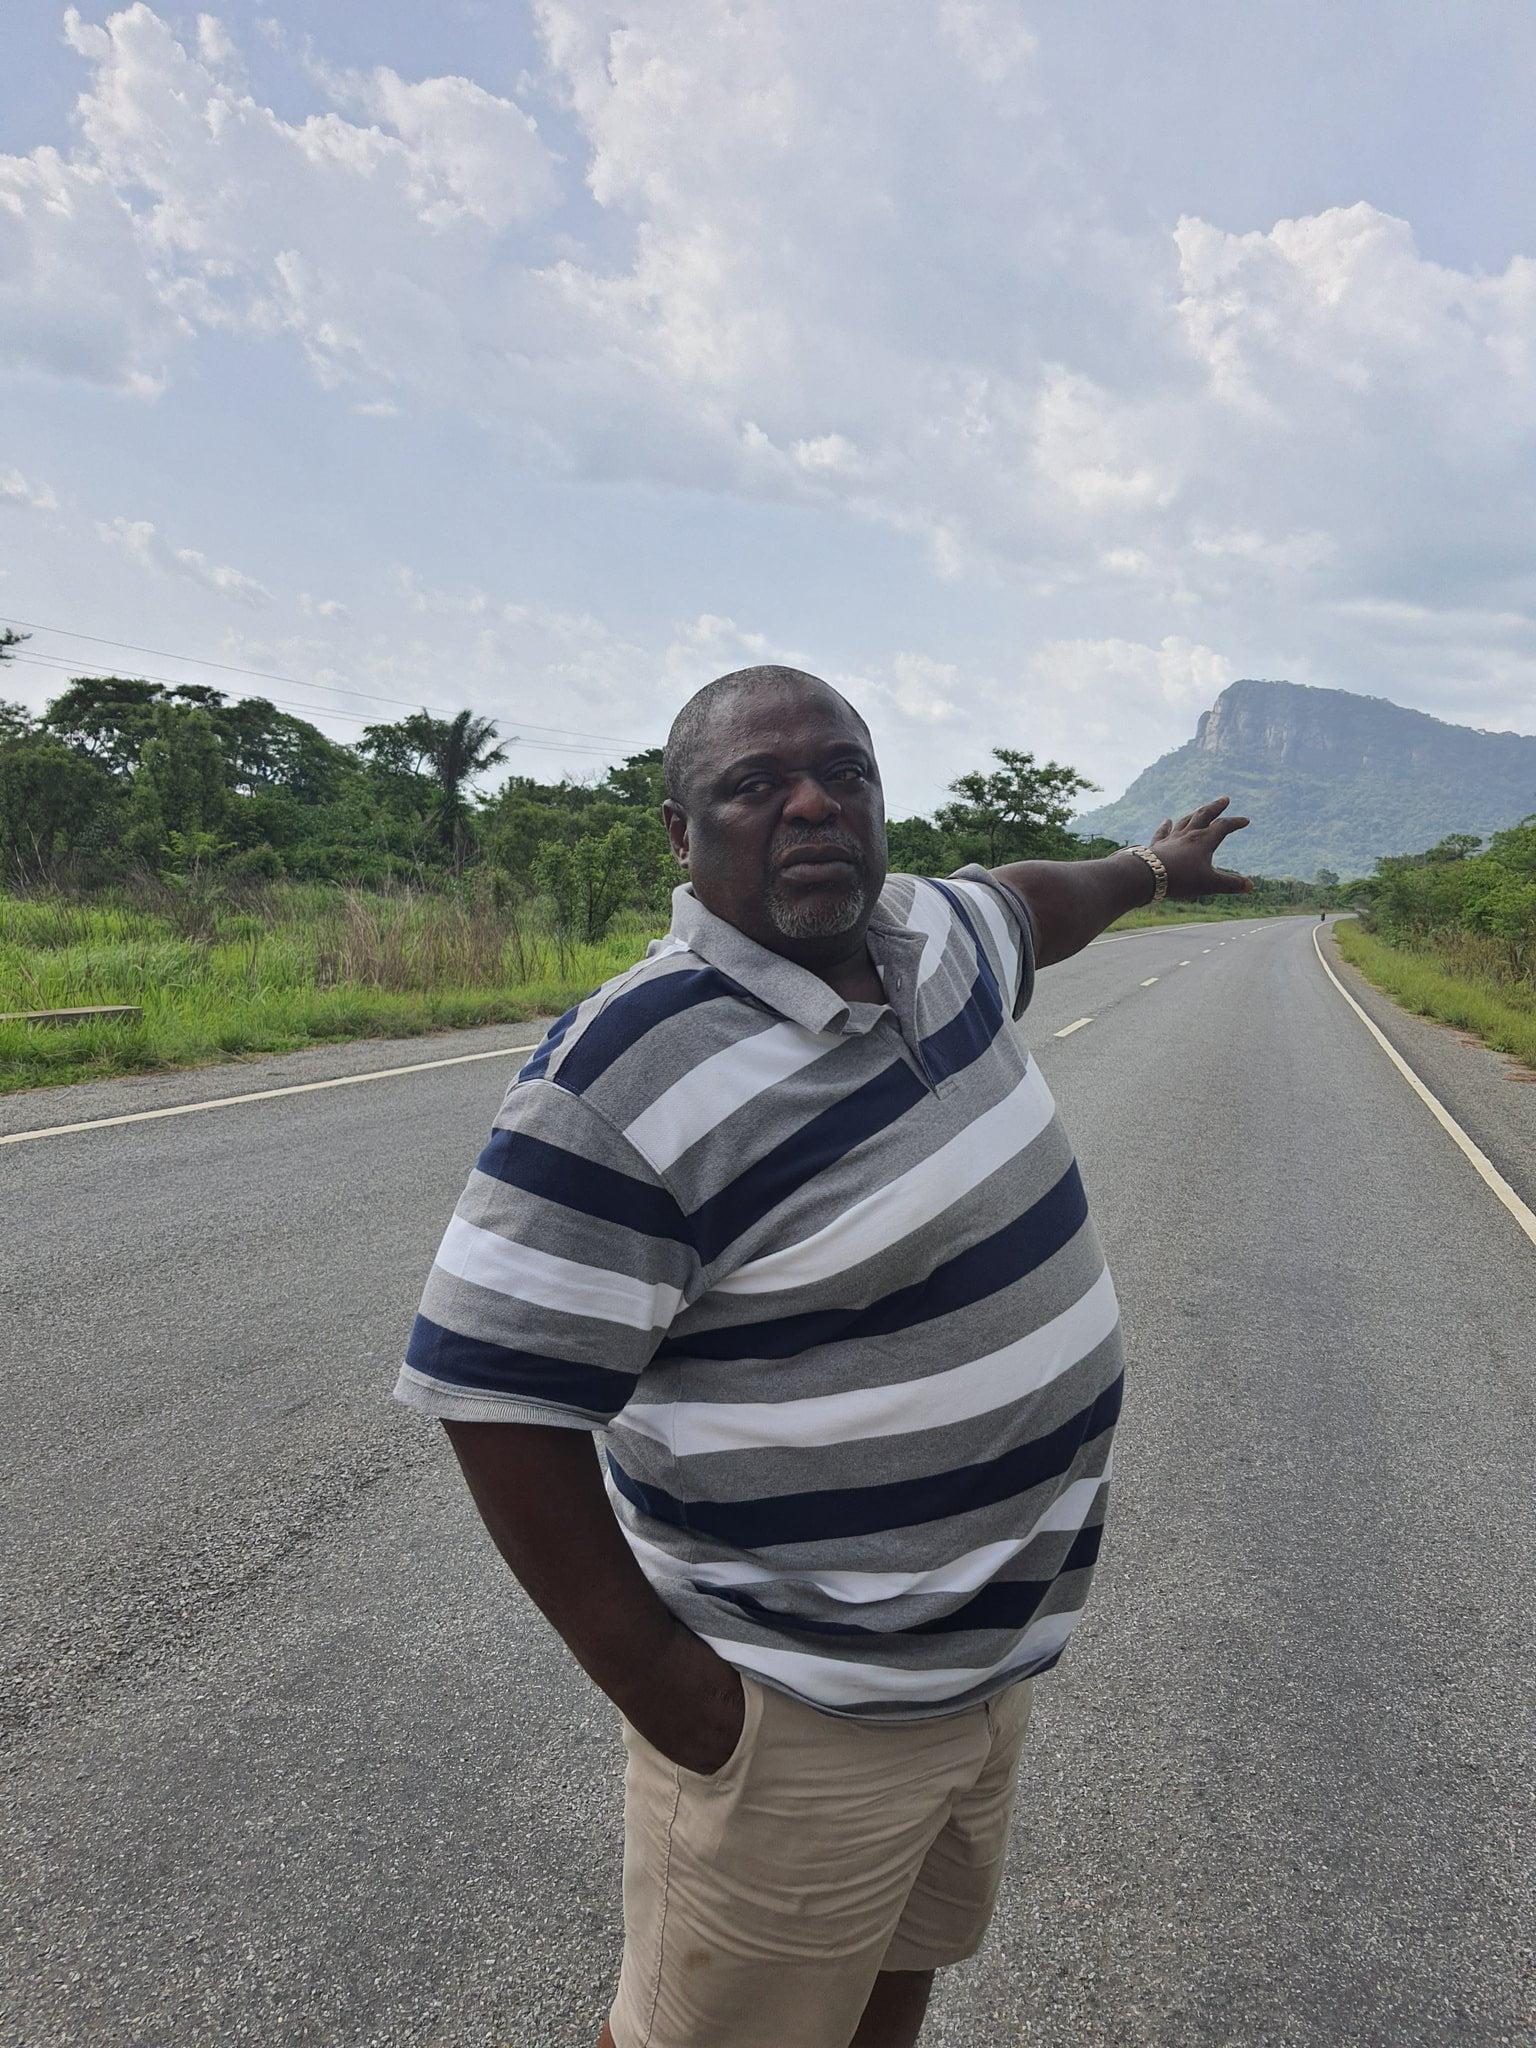 John Mahama Was 'Evil' Against Atta-Mills - Koku Anyidoho Speaks. 2 » Best Tech News, Gadgets, FinTech and Telco news.